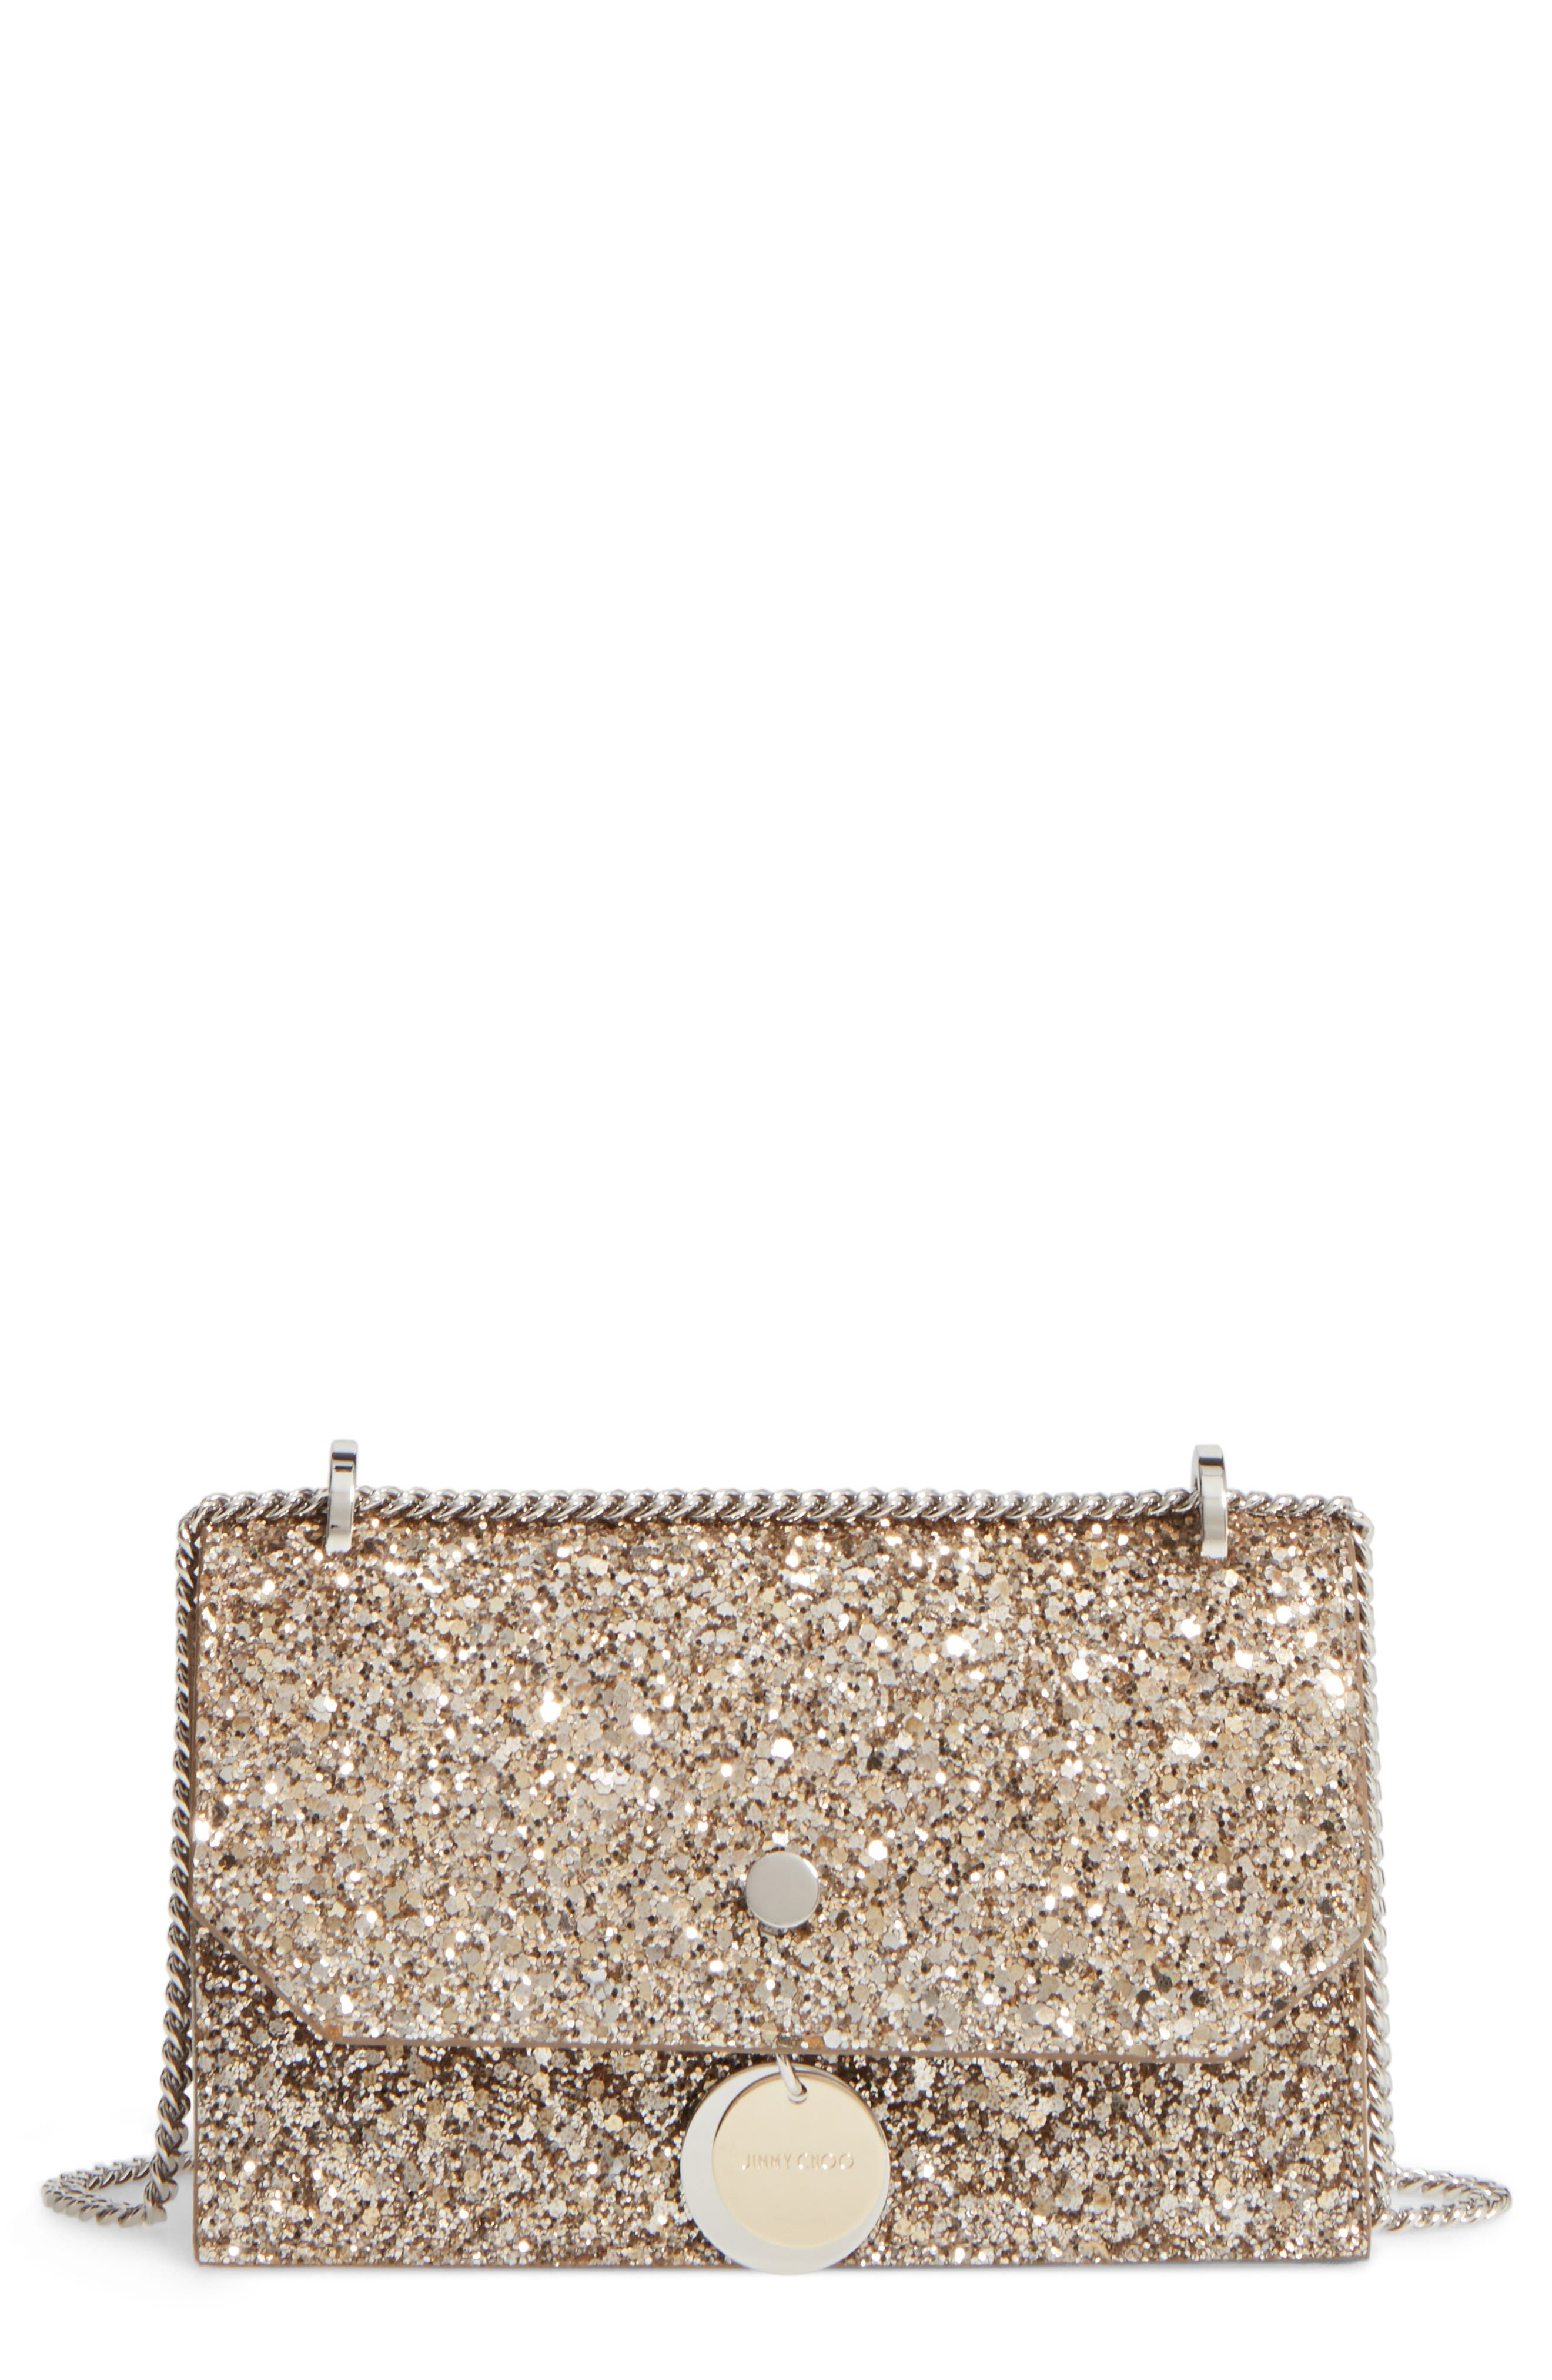 Finley Shadow Glitter Shoulder Bag,                             Main thumbnail 1, color,                             Antique Gold